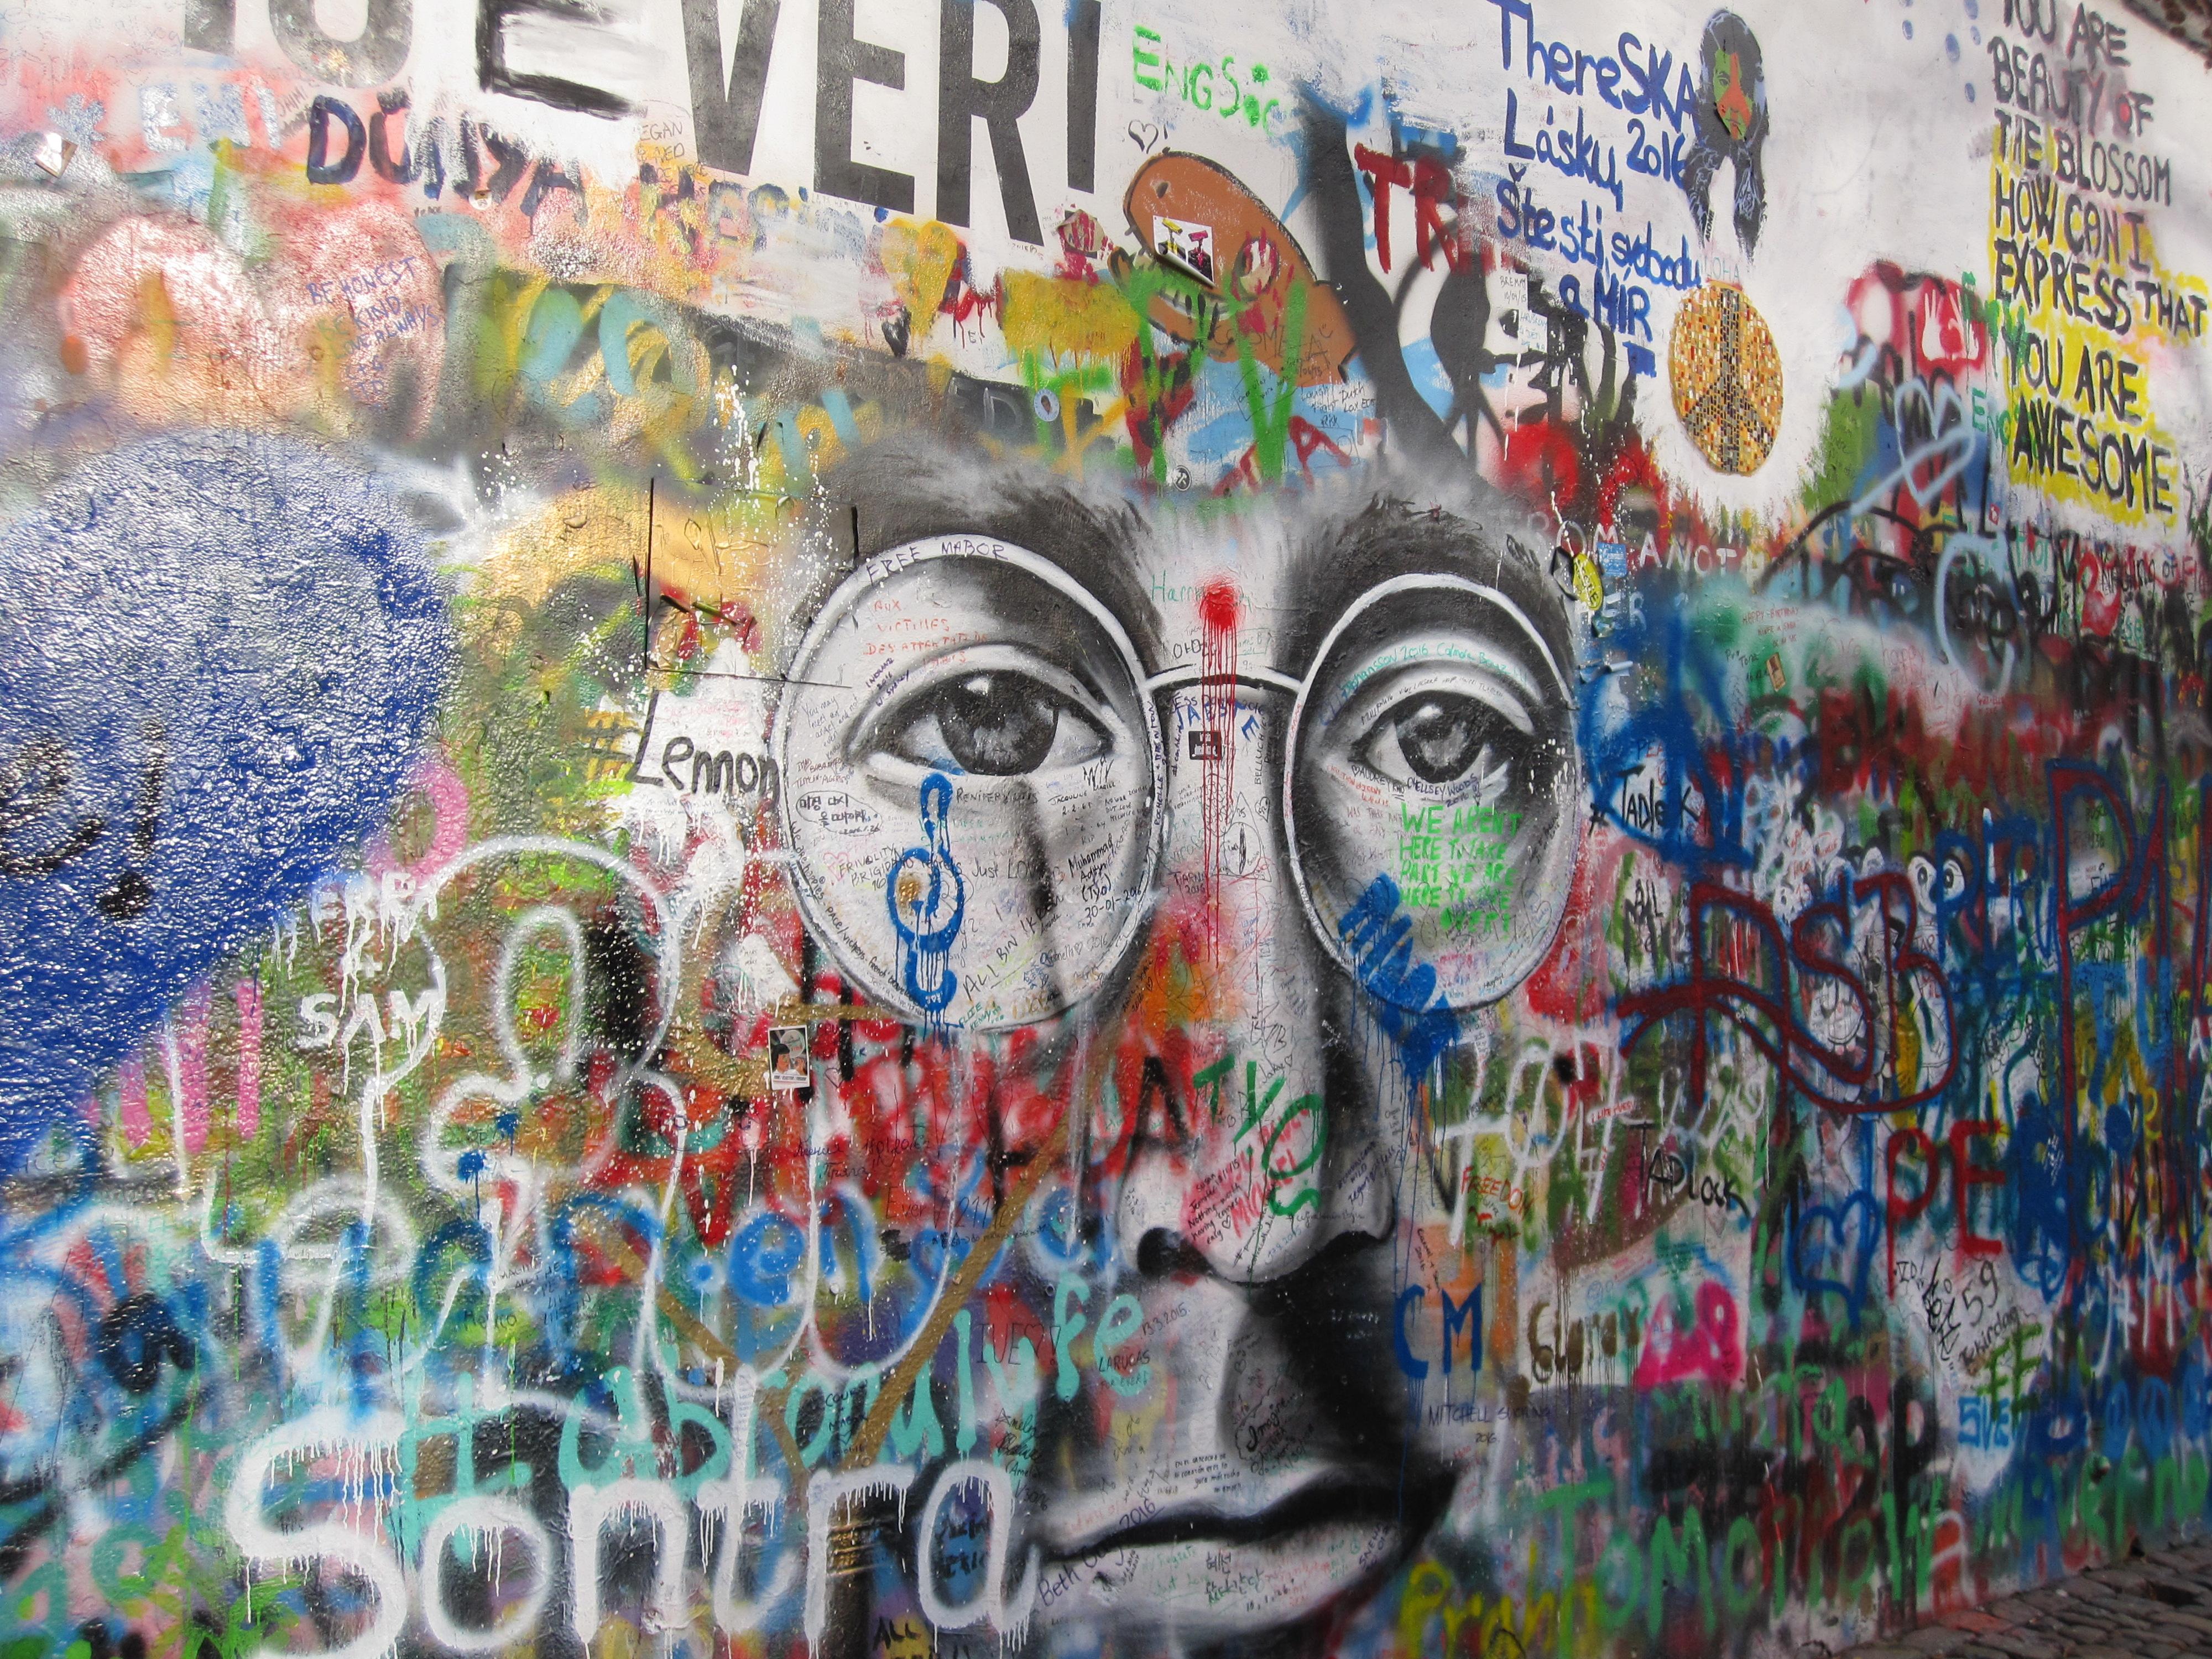 Detail John Lennon wall